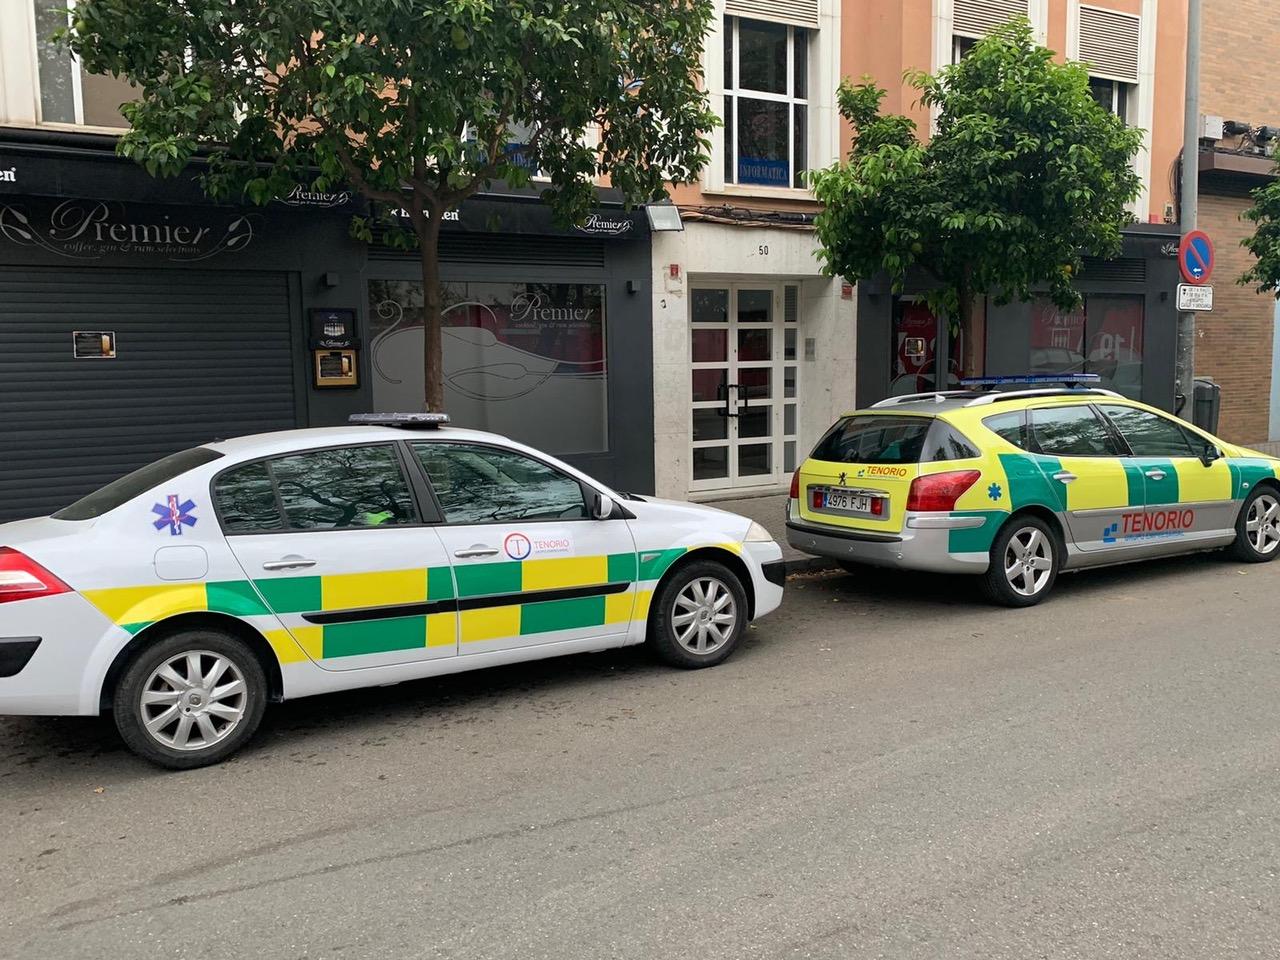 https://ambulanciastenorio.com/wp-content/uploads/2020/04/vehiculos-intervencion-rapida.jpeg